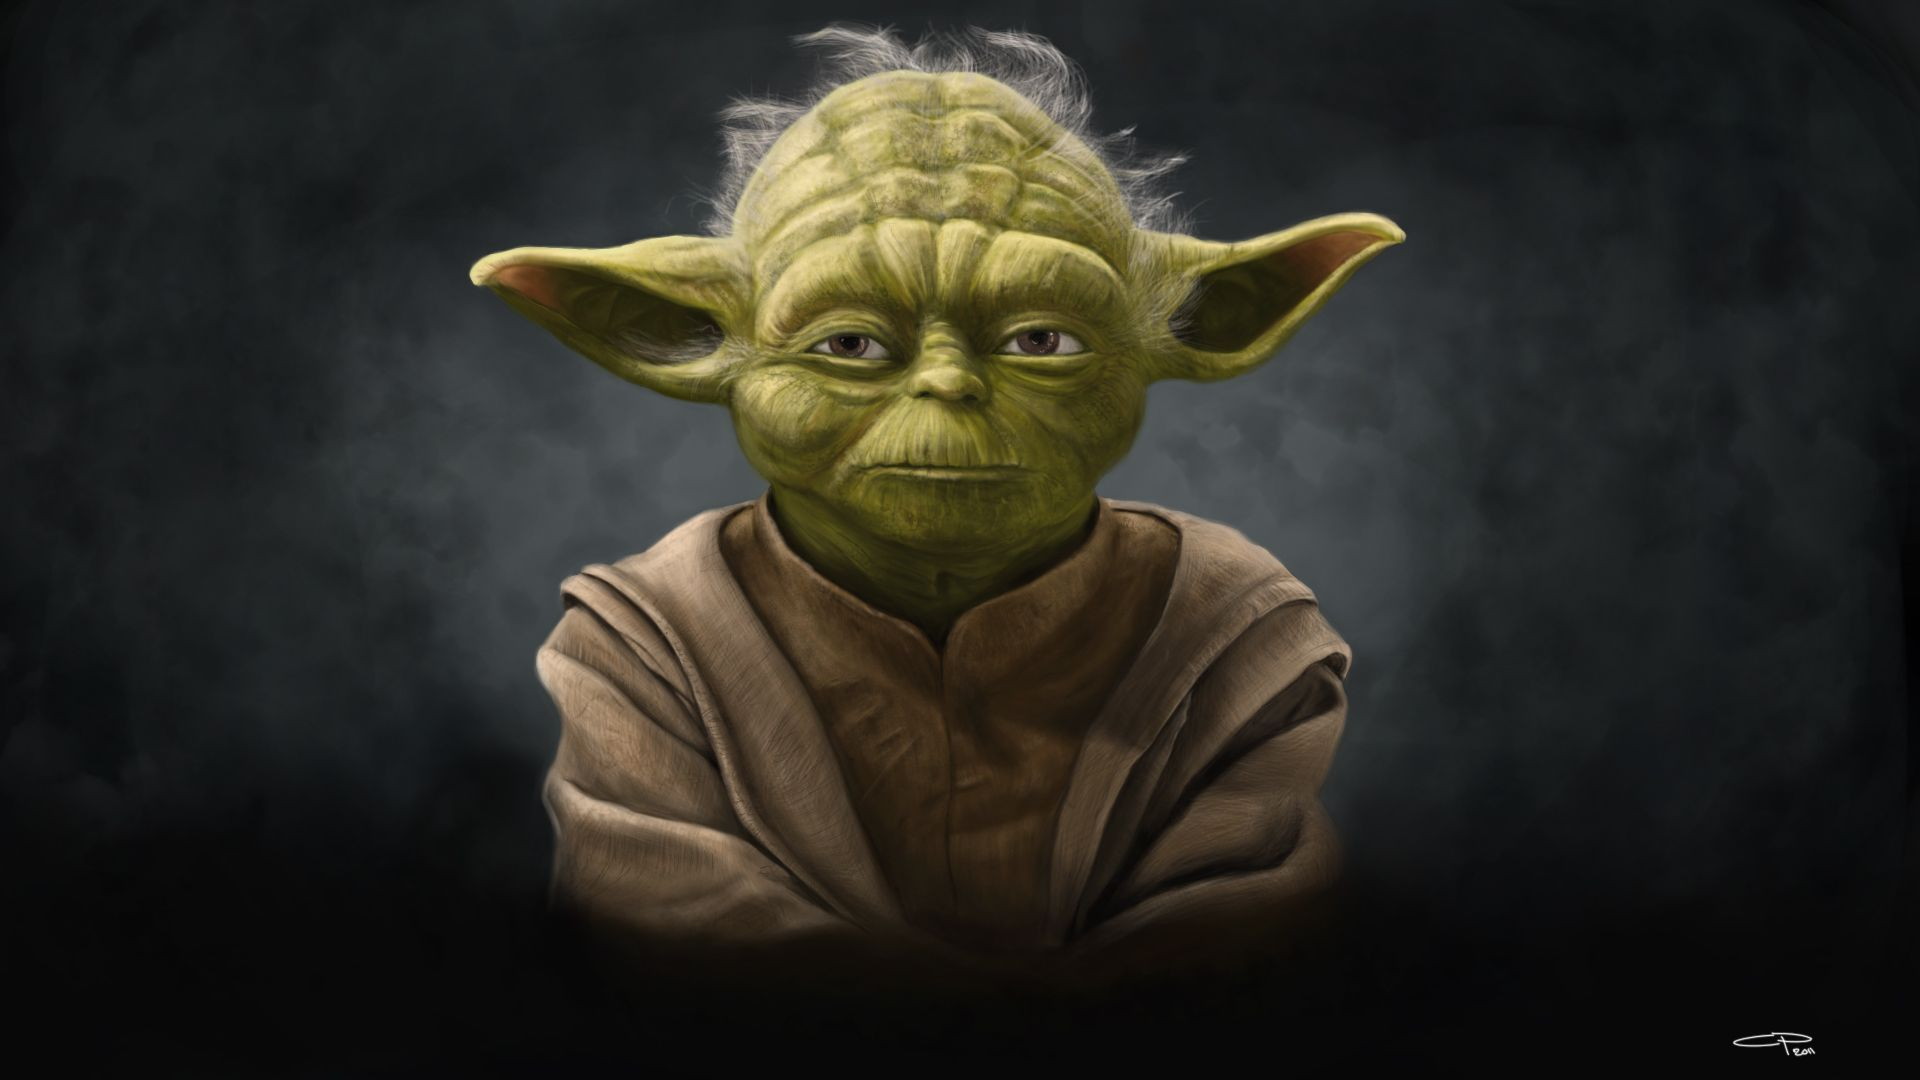 Yoda Wallpapers Top Free Yoda Backgrounds Wallpaperaccess